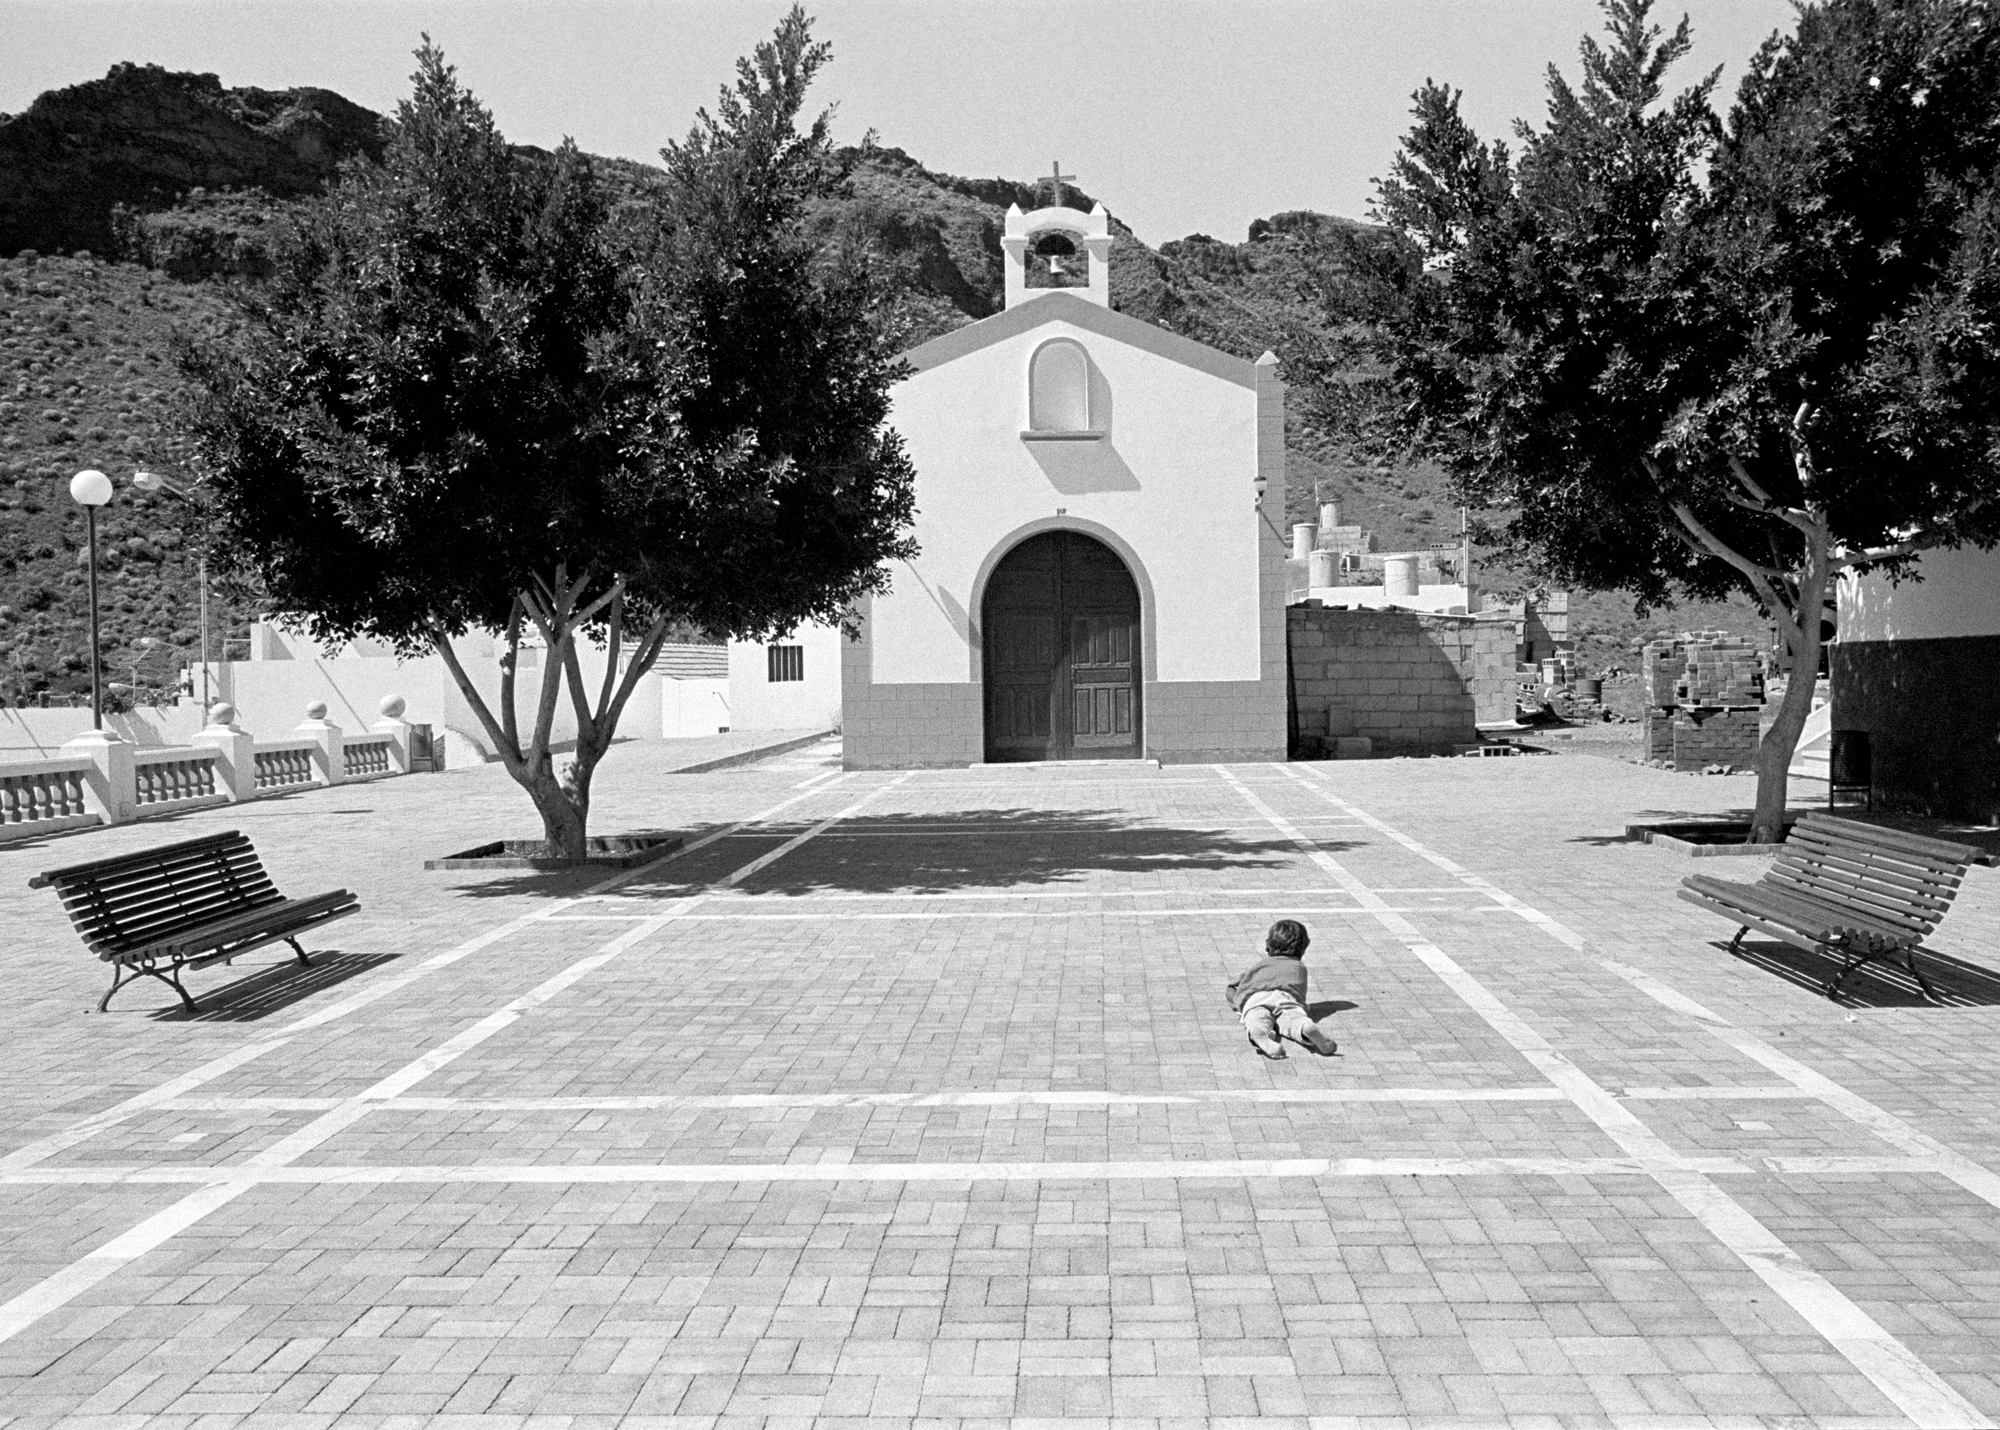 Grand Canaria, Canary Islands 1977